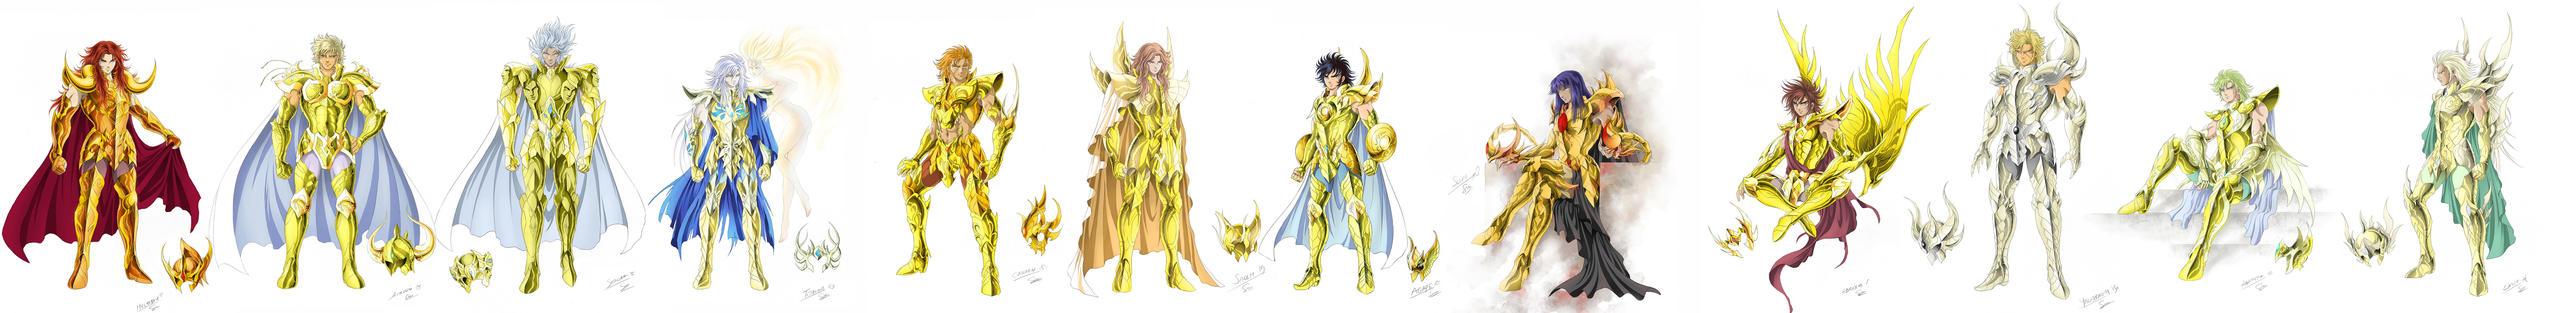 Frieze of gold saints by SpaceWeaver